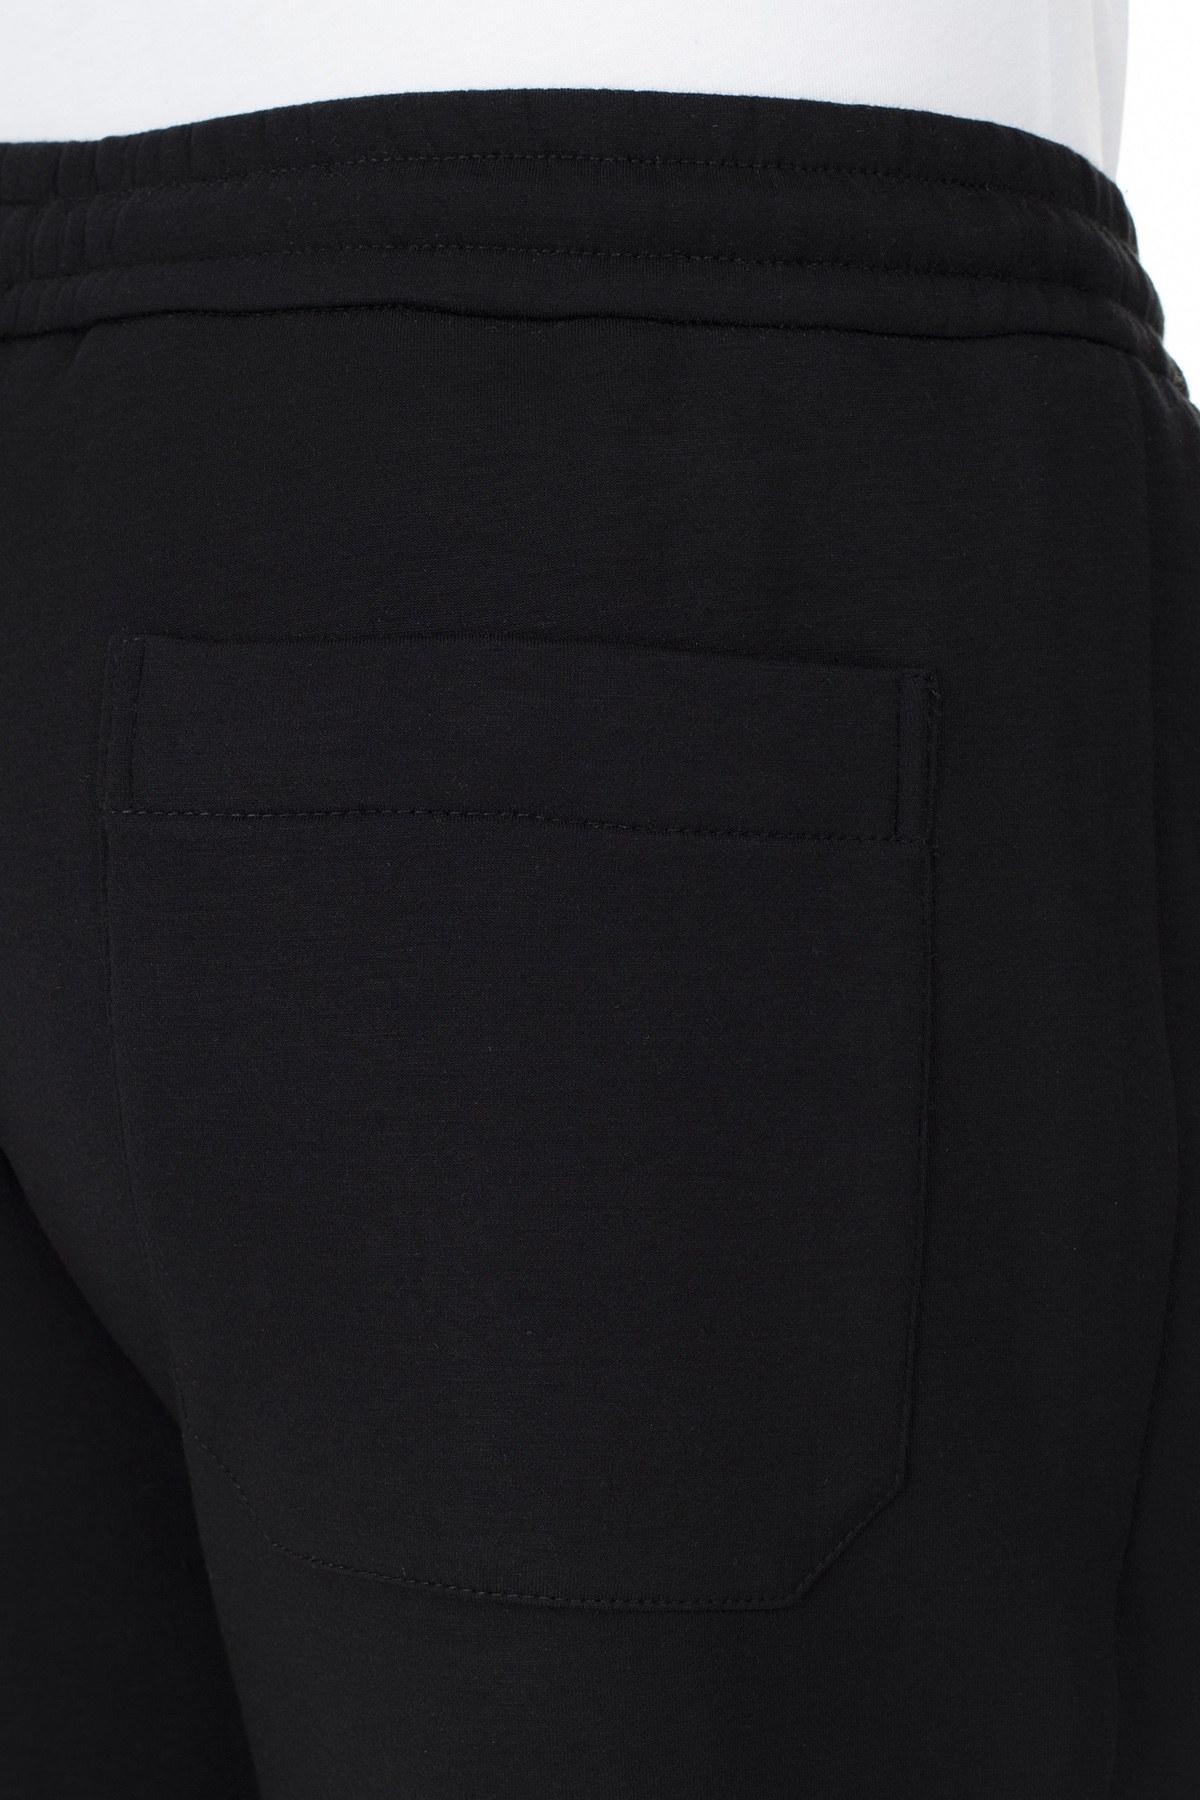 Emporio Armani Erkek Pantolon S 6G1PP3 1JTYZ 0999 SİYAH